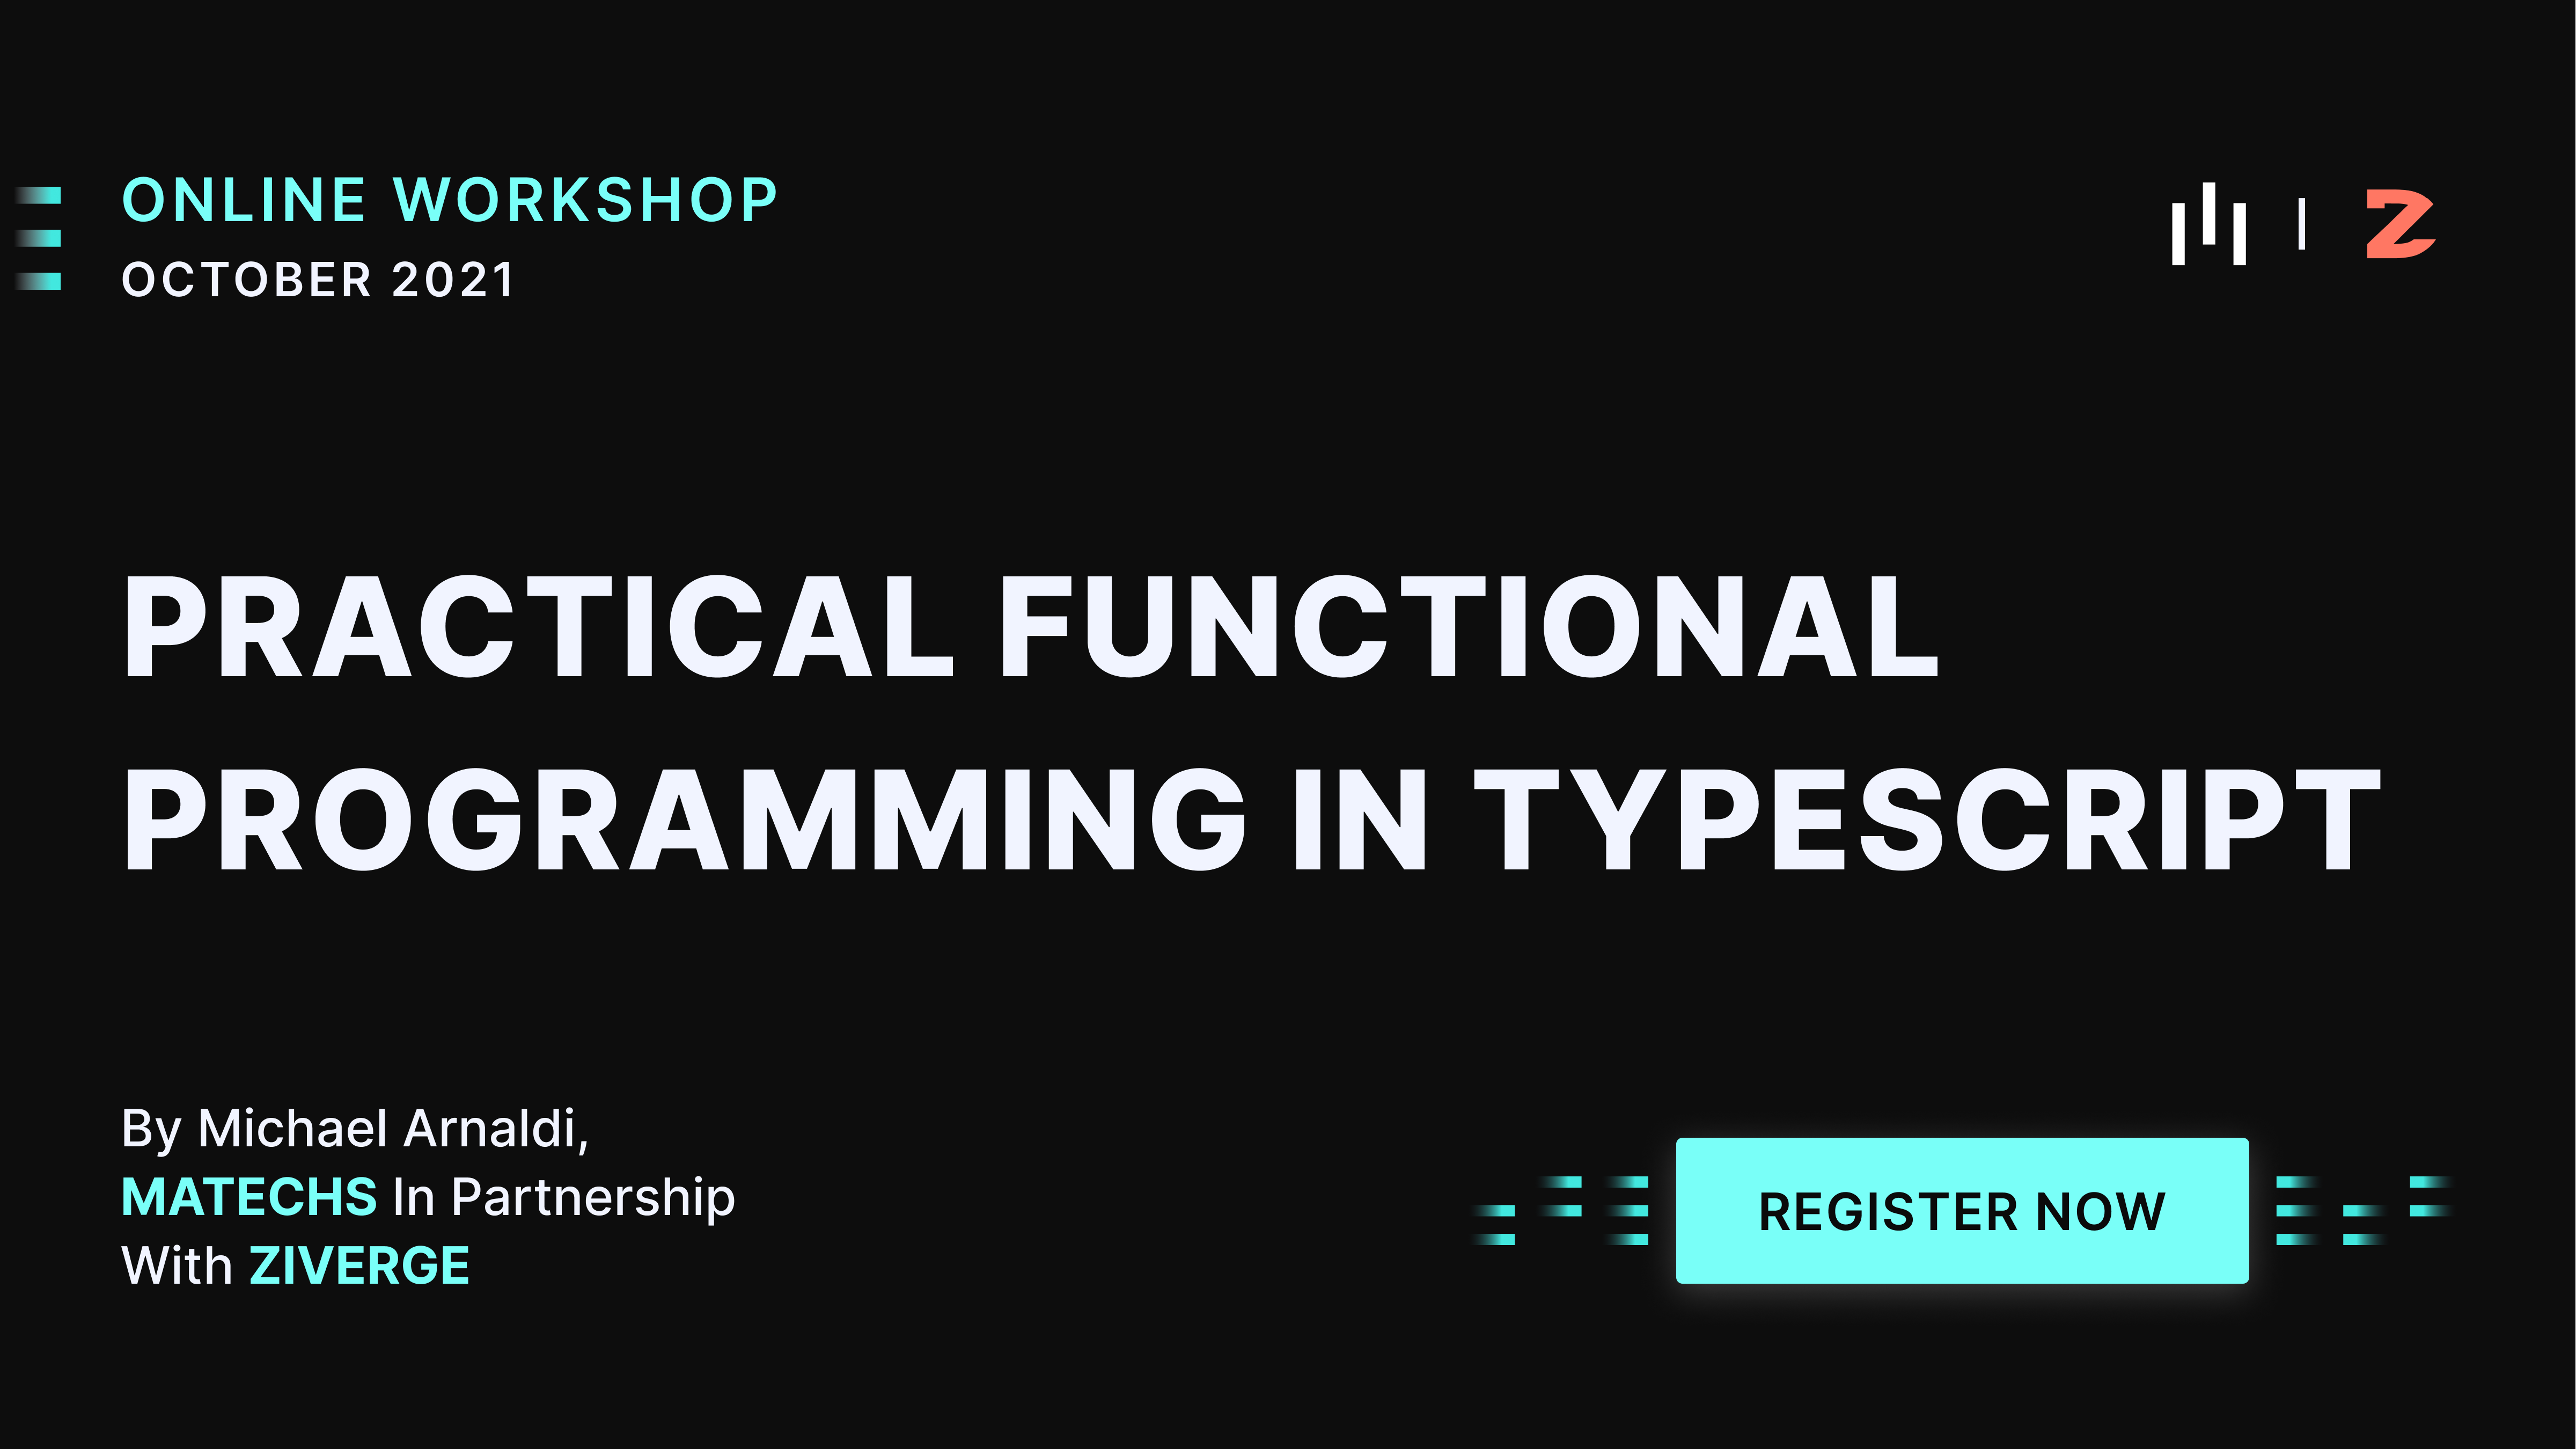 Practical Functional Programming in Typescript